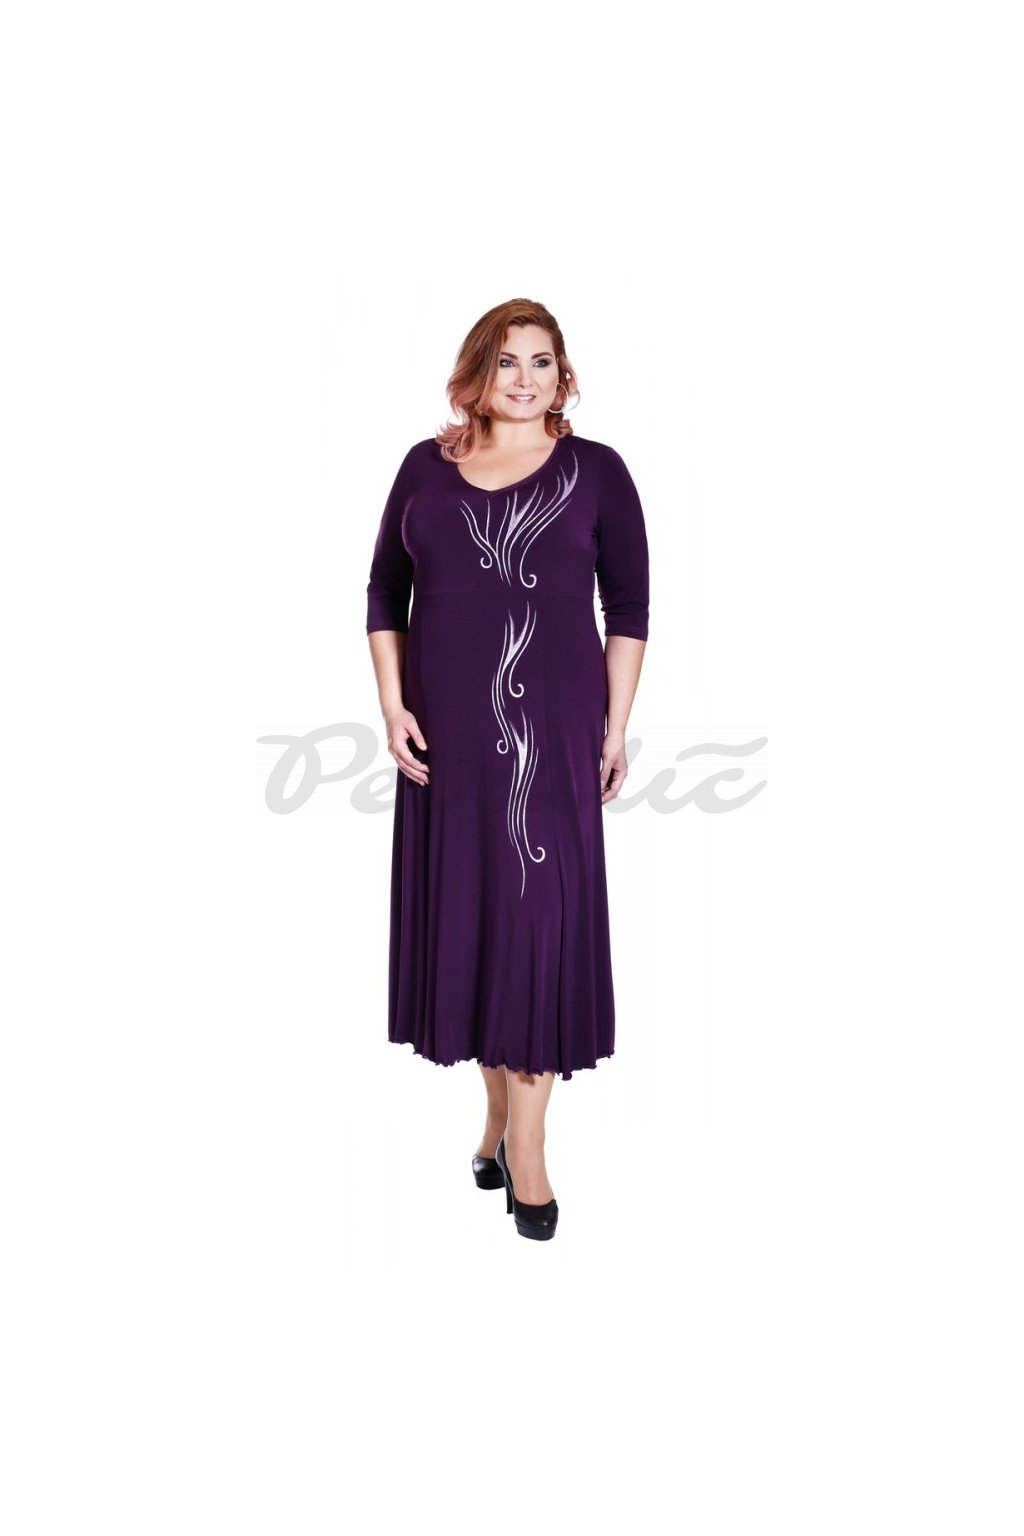 MÁJA - šaty 3/4 rukáv 120 - 125 cm